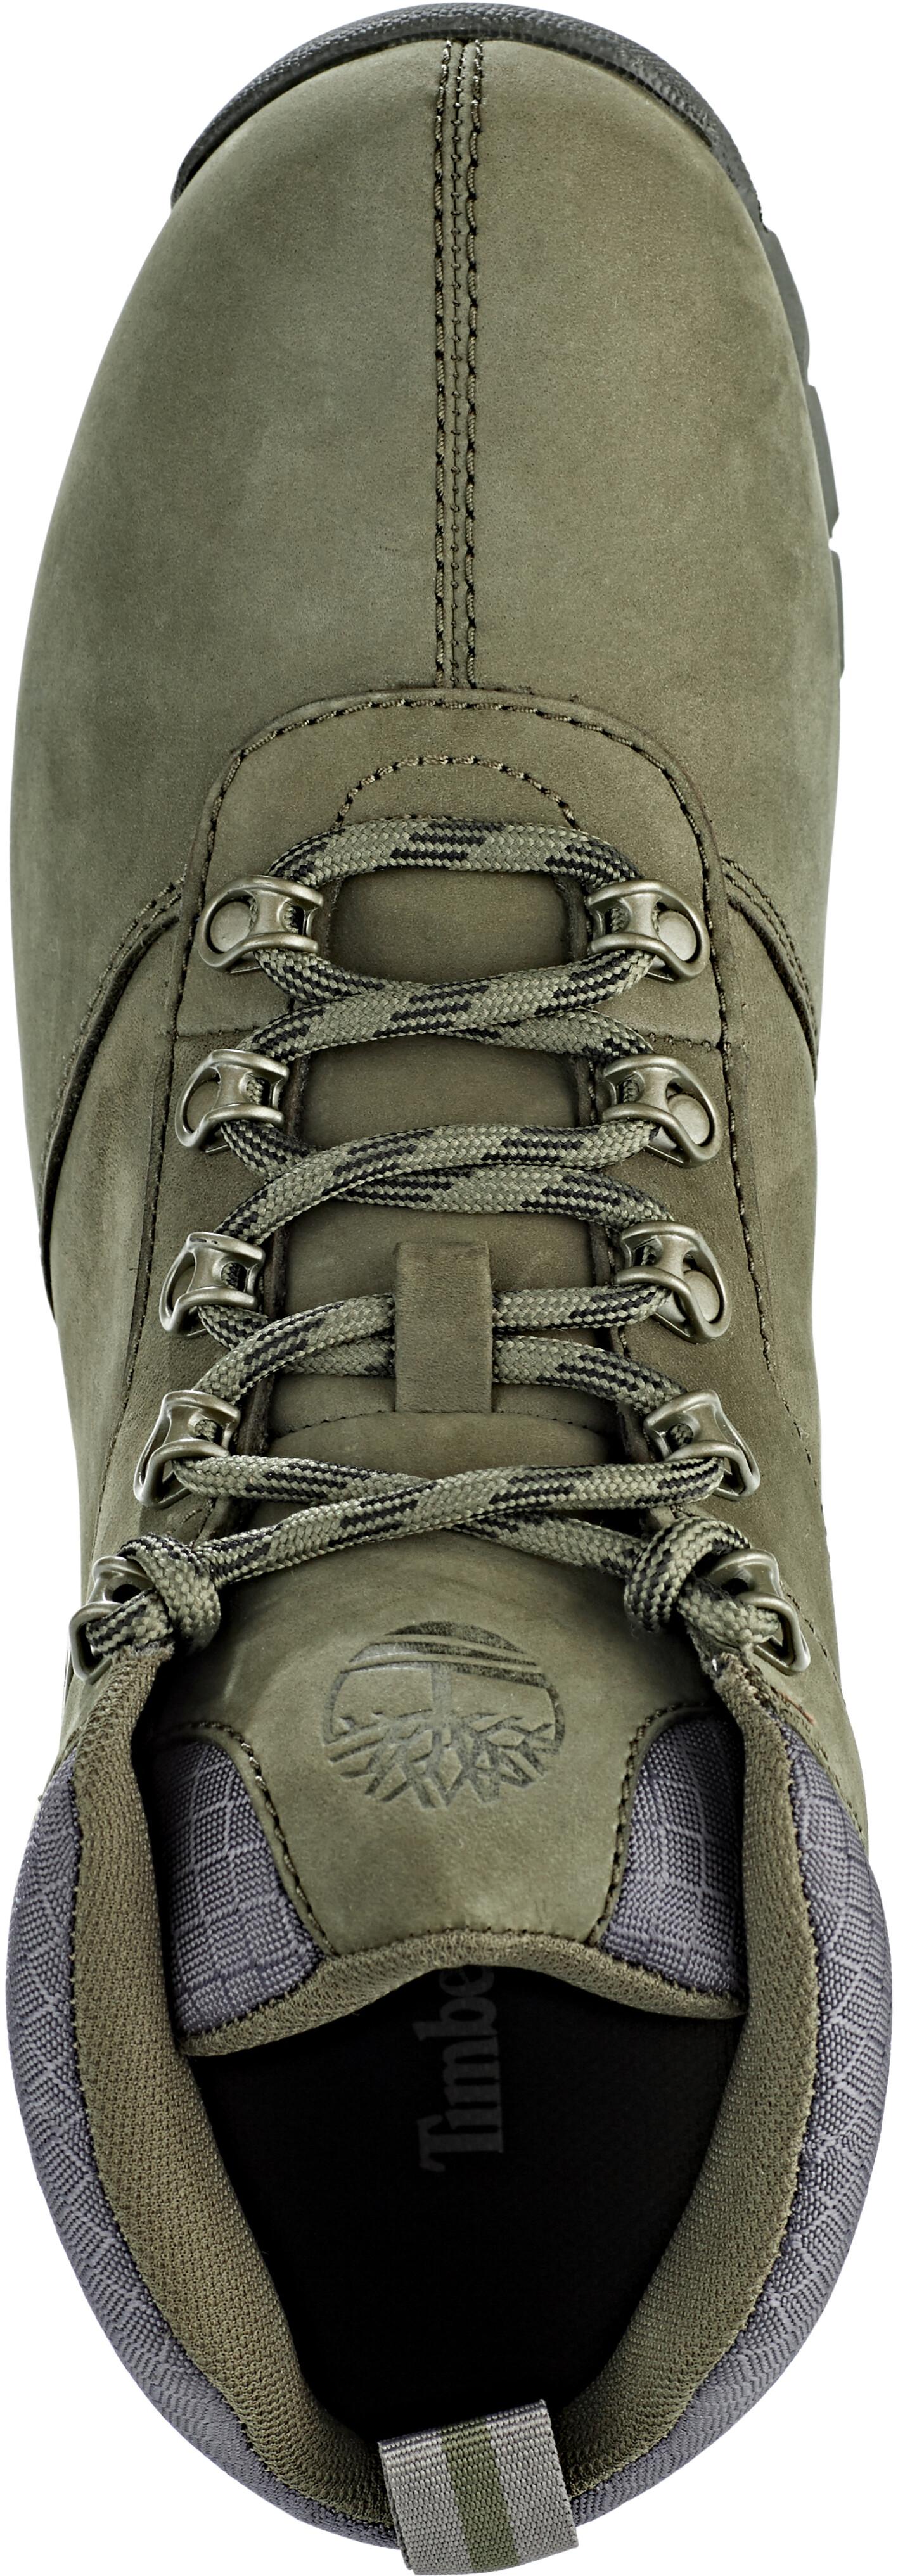 0df06909ff Timberland Splitrock 2 Hiker Shoes Men dark green nubuck at ...